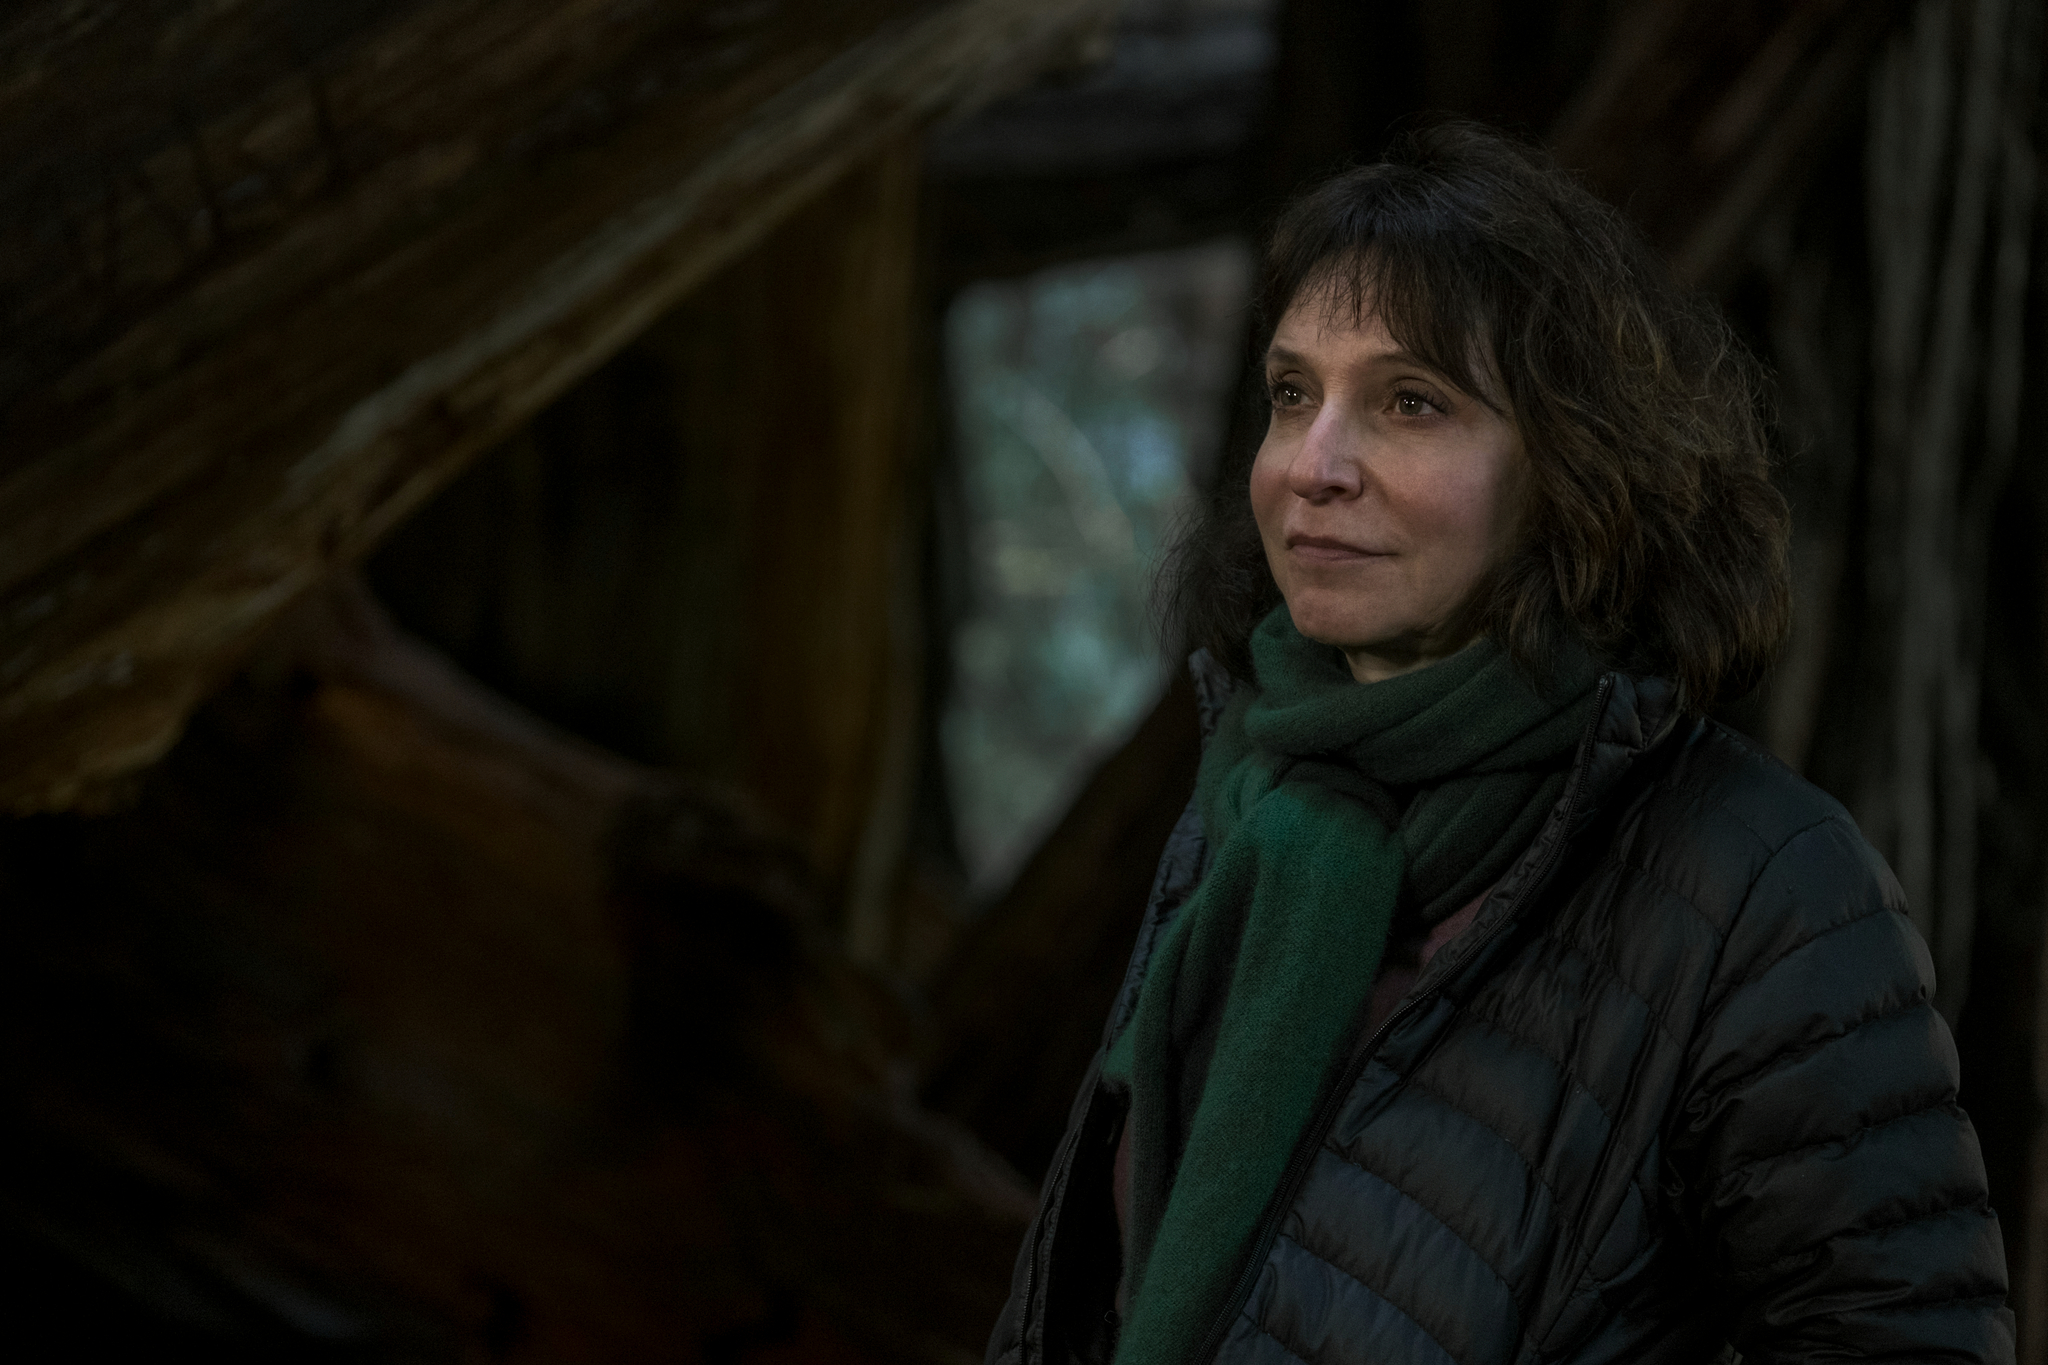 Susanne Bier in Bird Box (2018)